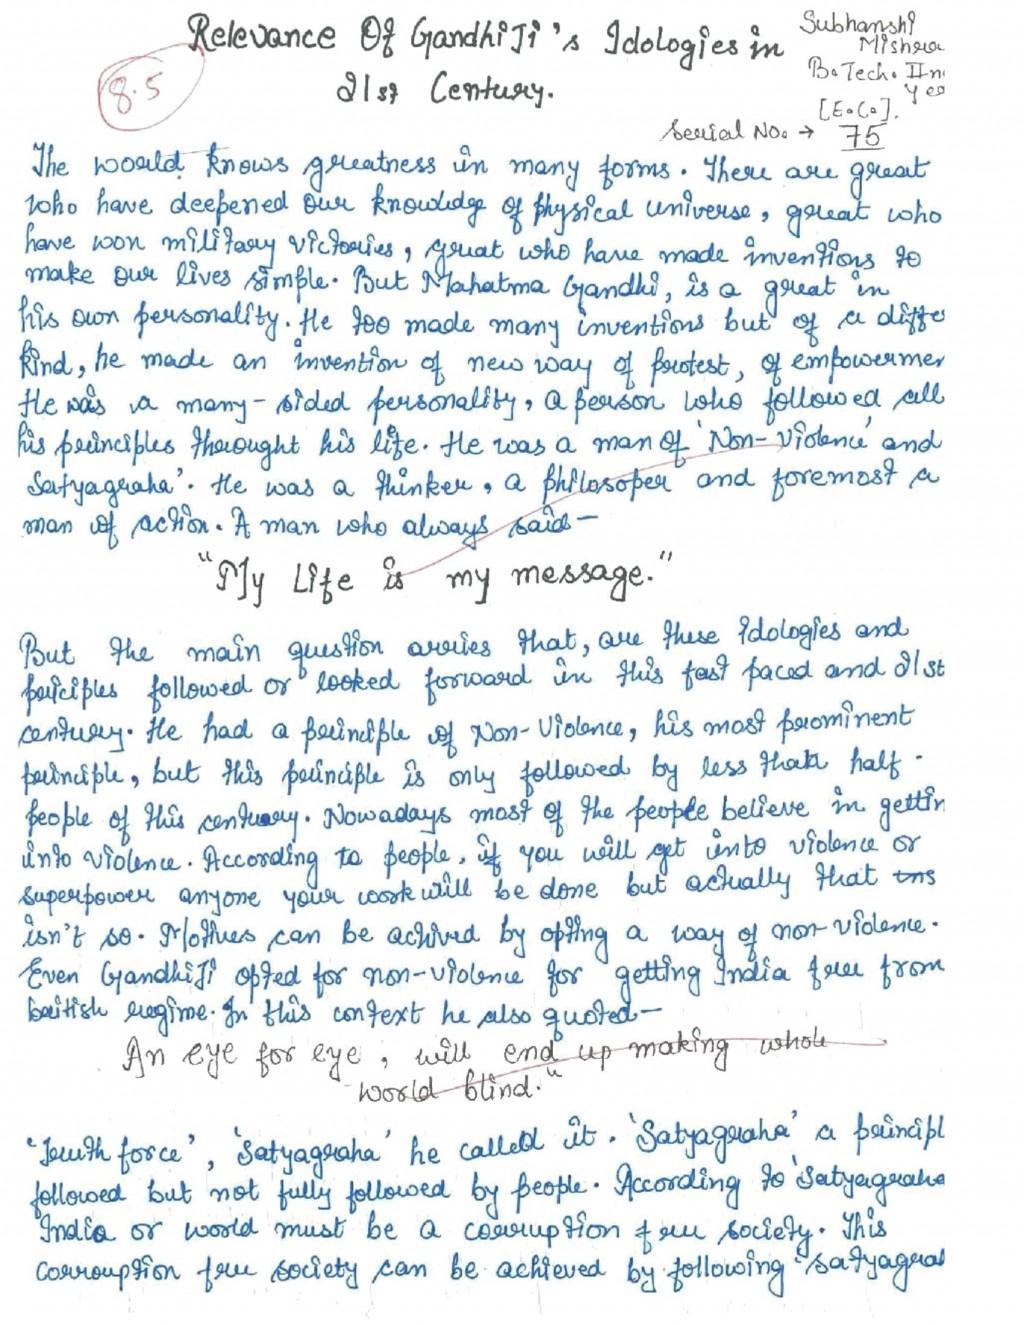 010 Essay2 Gandhiji Essay Sensational Mahatma Gandhi In Gujarati Pdf Free Download Hindi Language Ma Nibandh Large